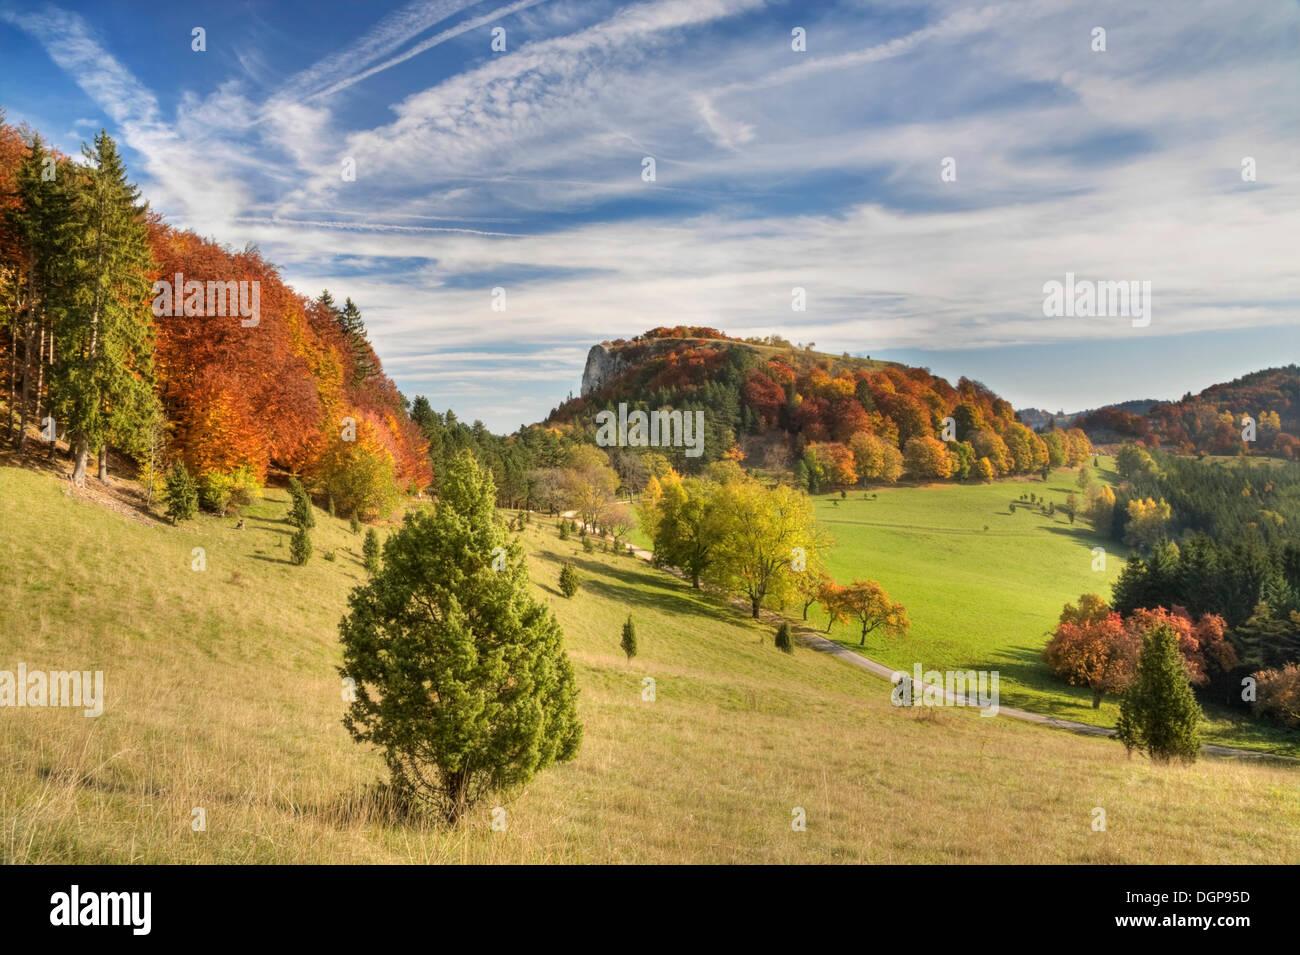 Juniper bushes on Lochen mountain in autumn, Zollernalb district, Swabian Alps, Baden-Wuerttemberg - Stock Image